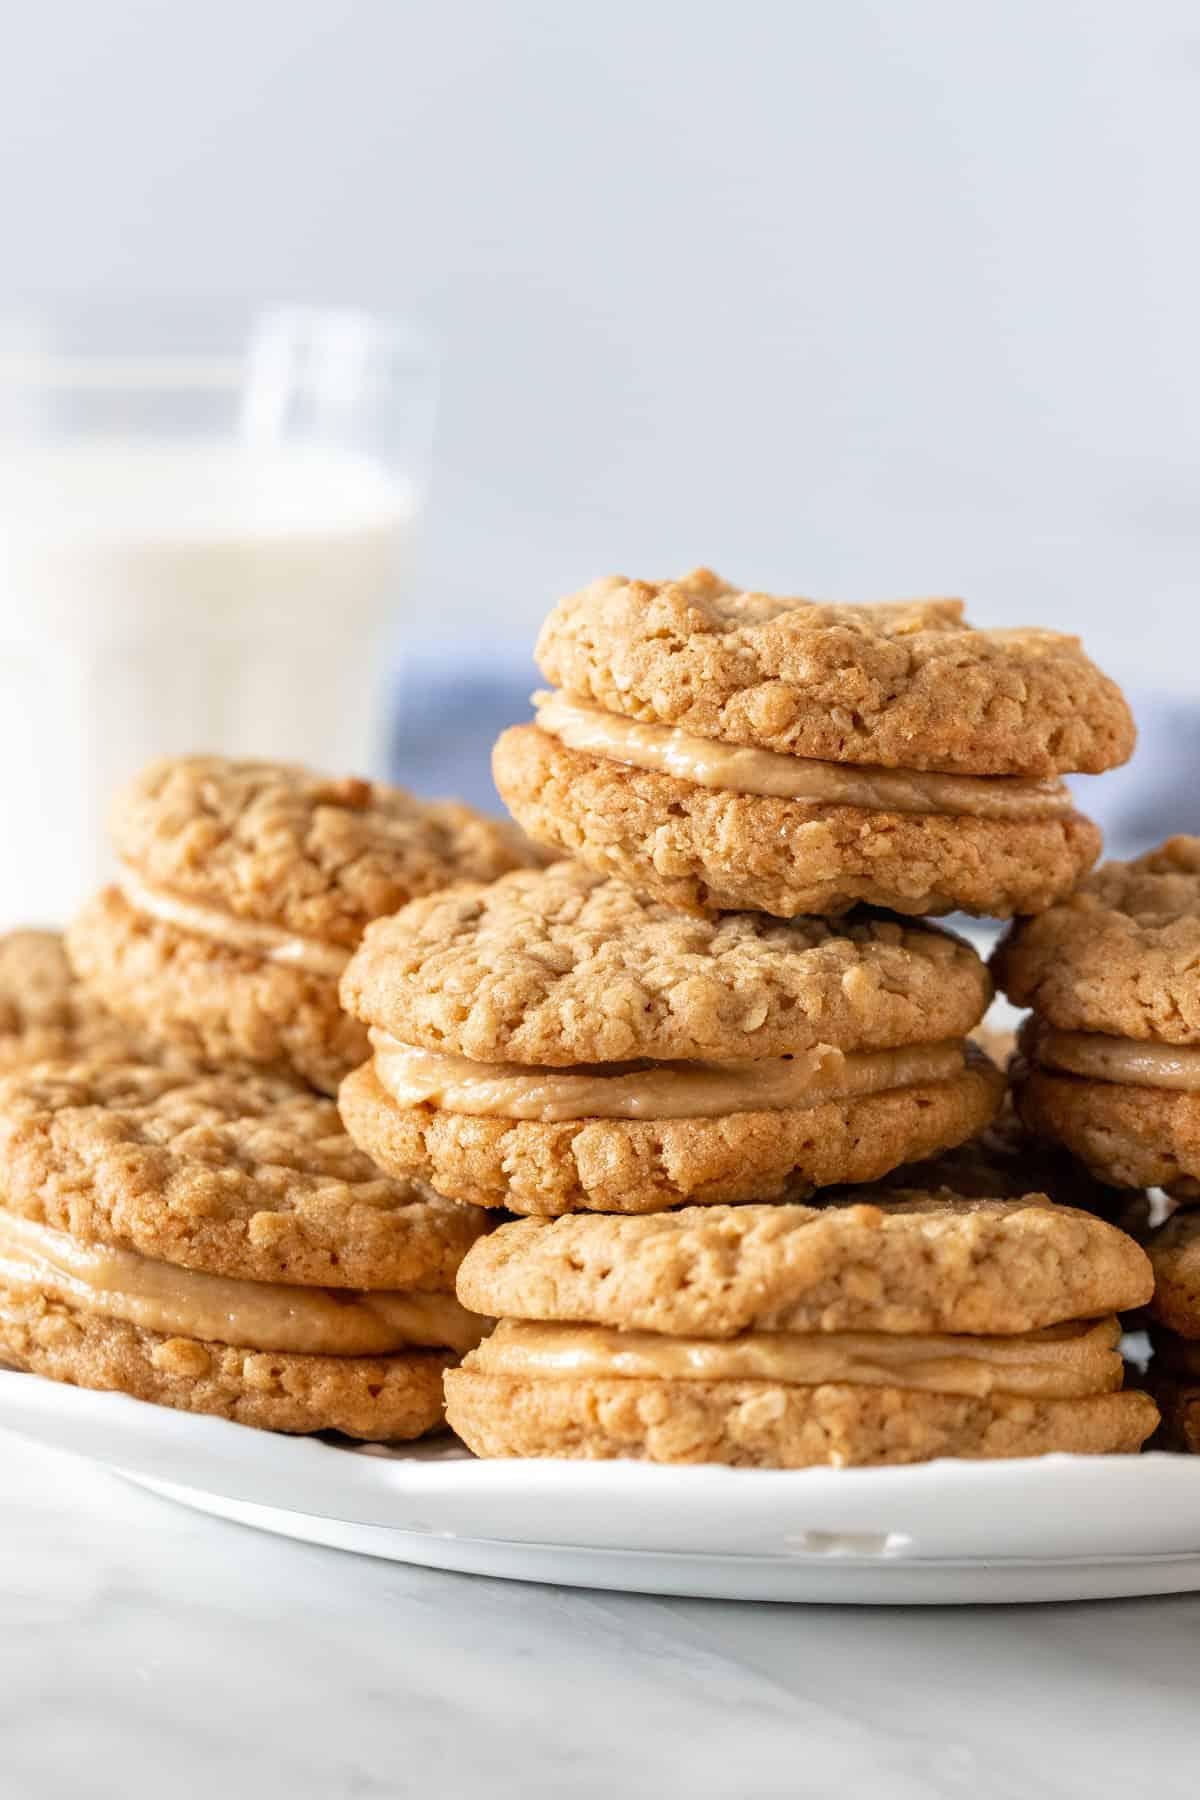 Plate of peanut butter sandwich cookies.